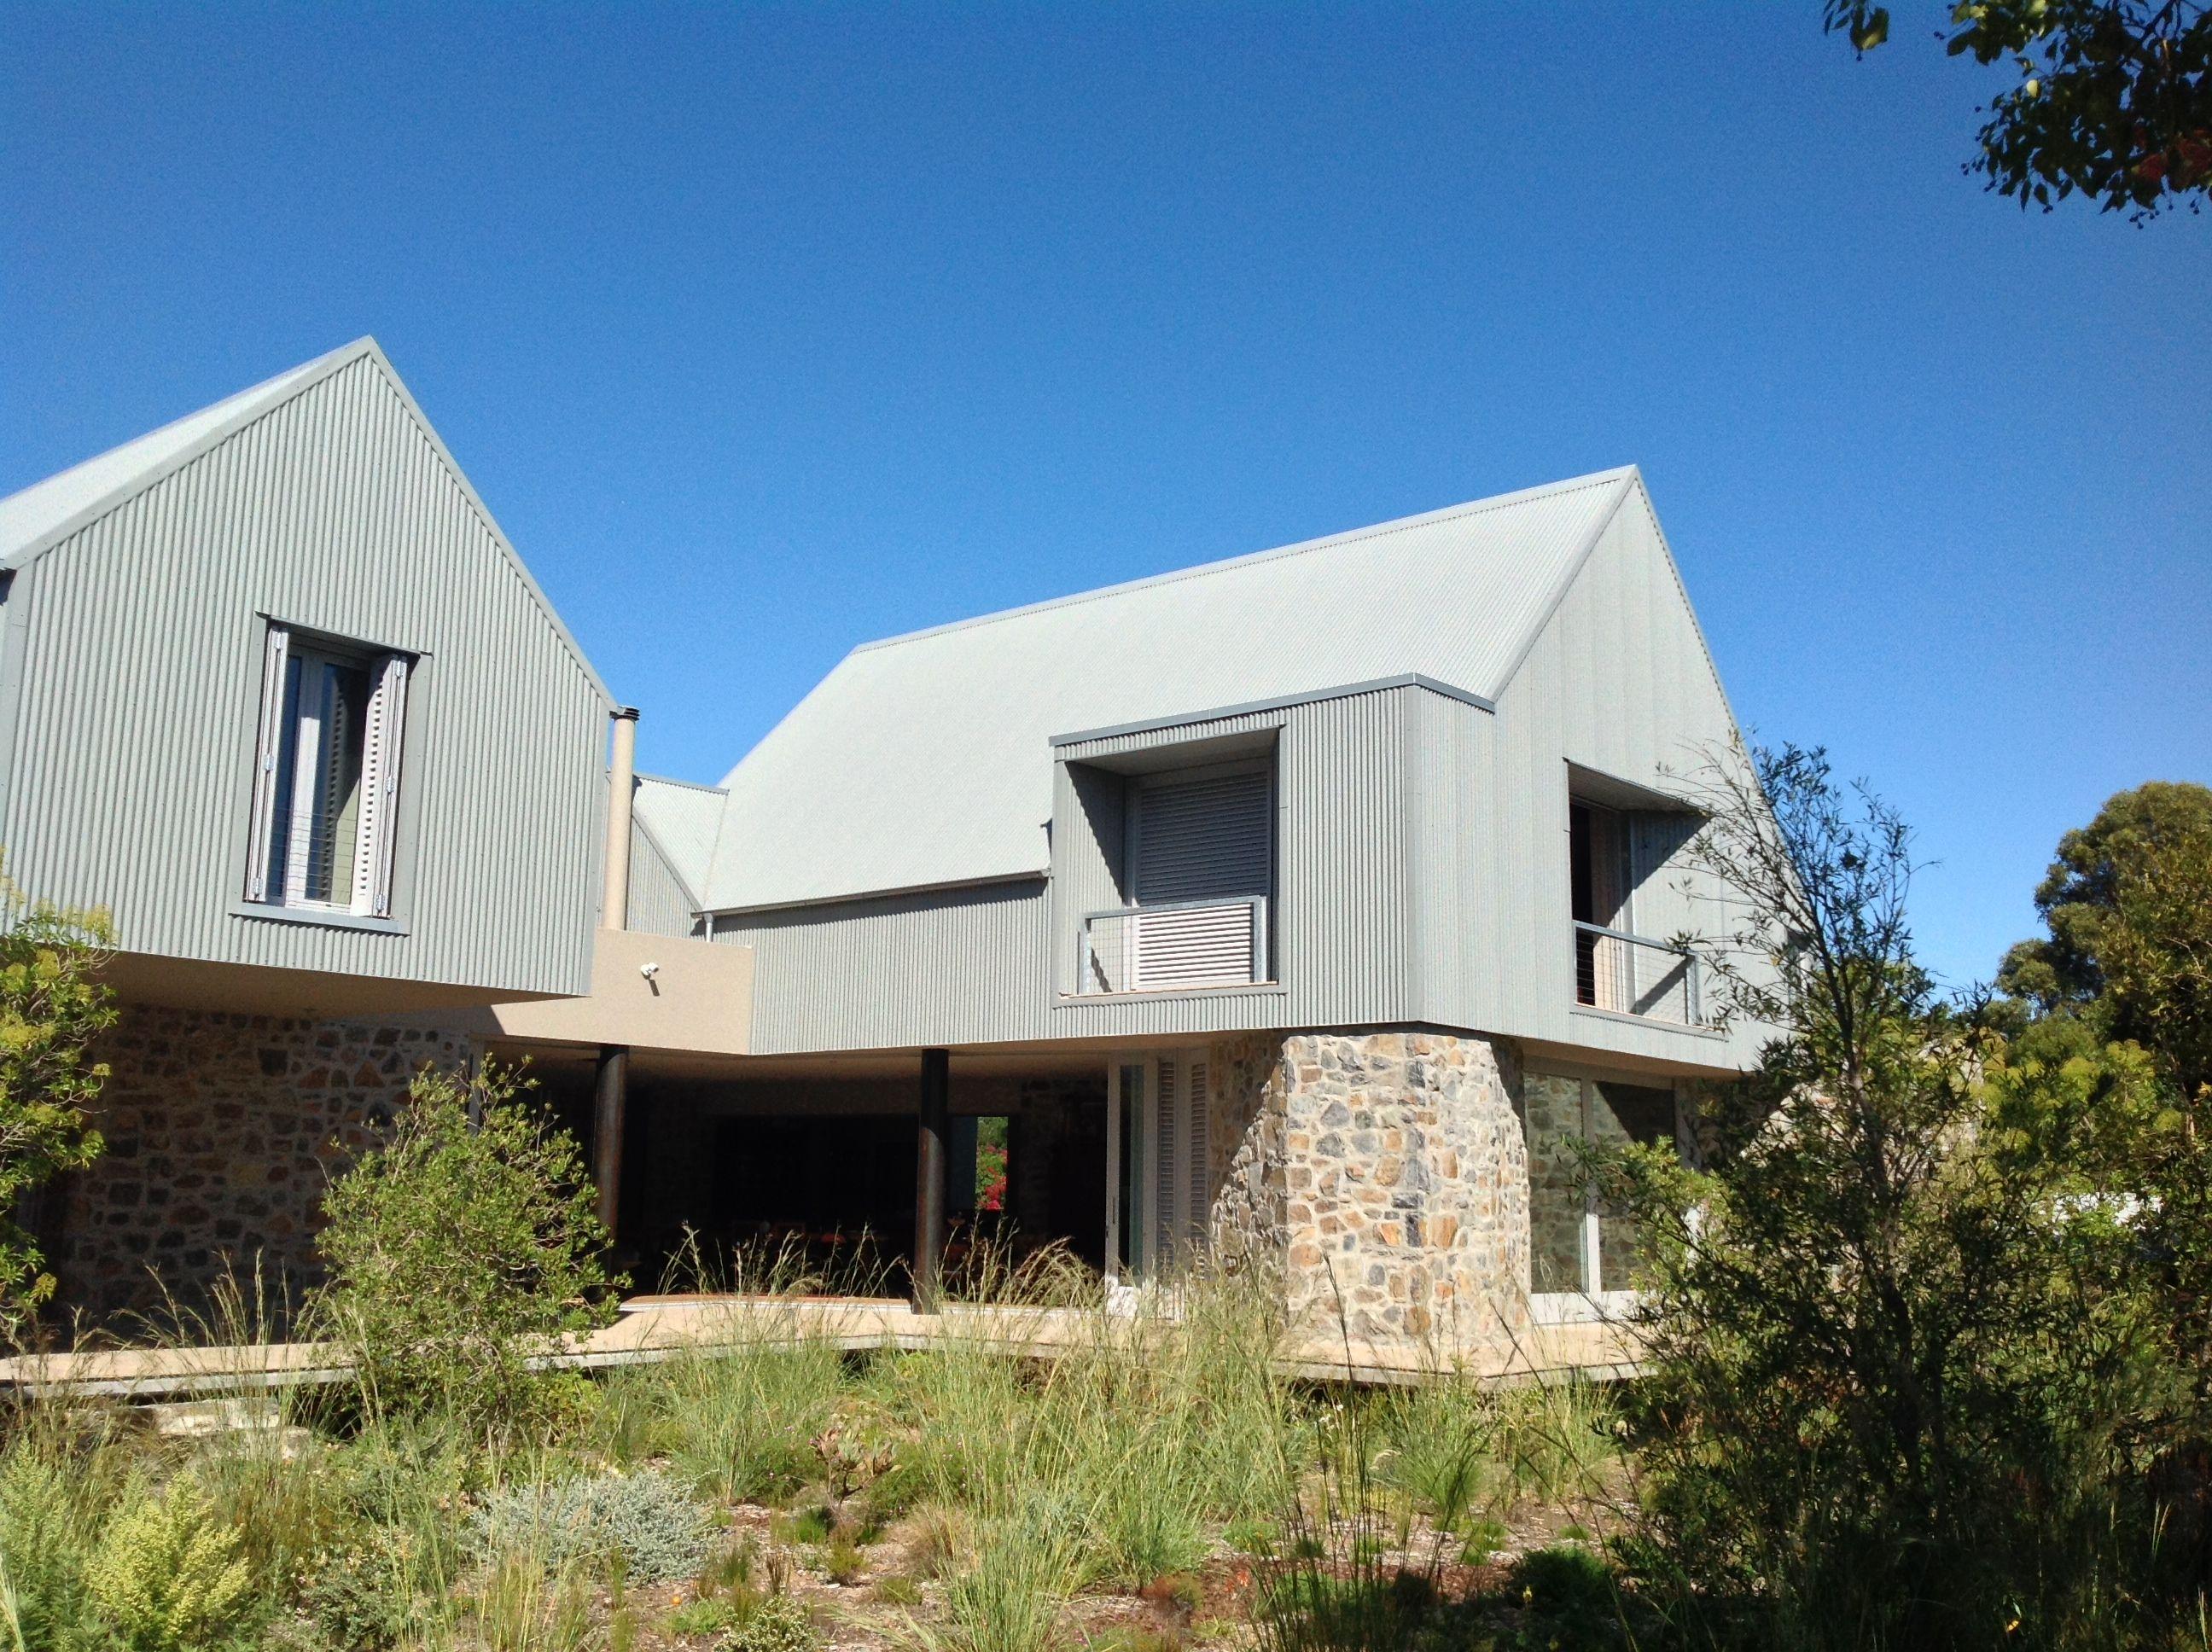 Zinc house slee co architects buildings for Architecture zinc